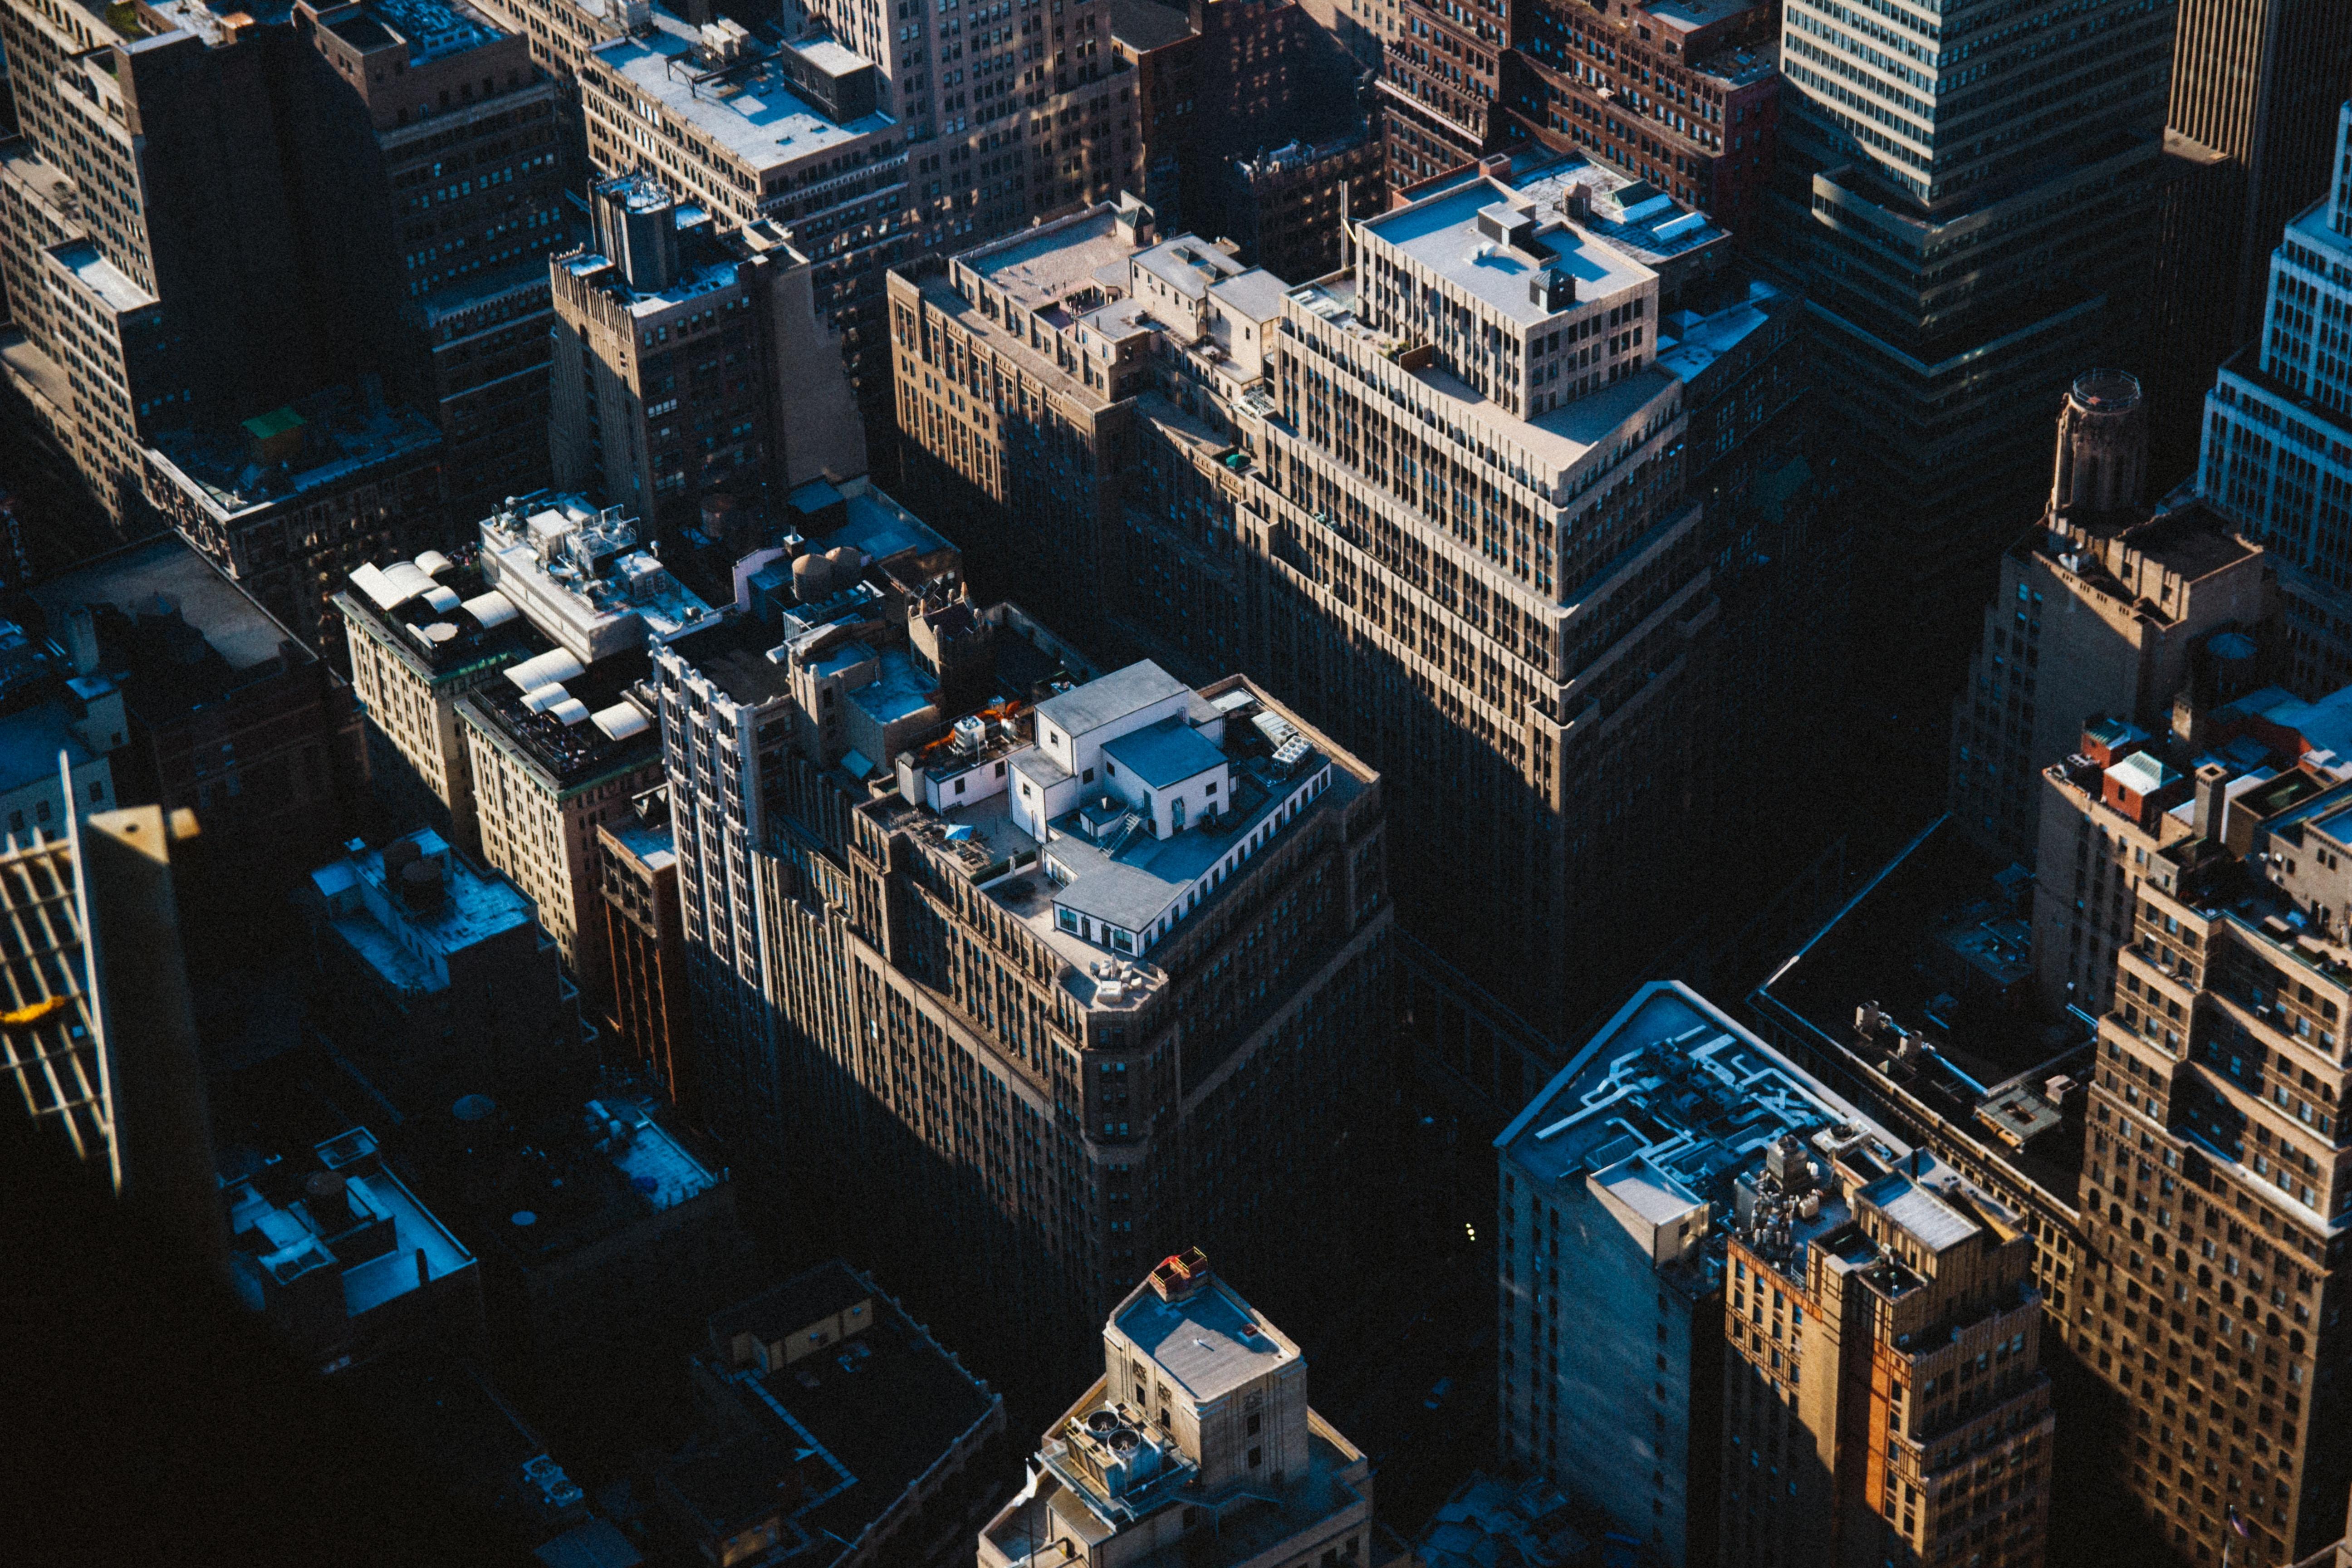 bird's-eye view of buildings